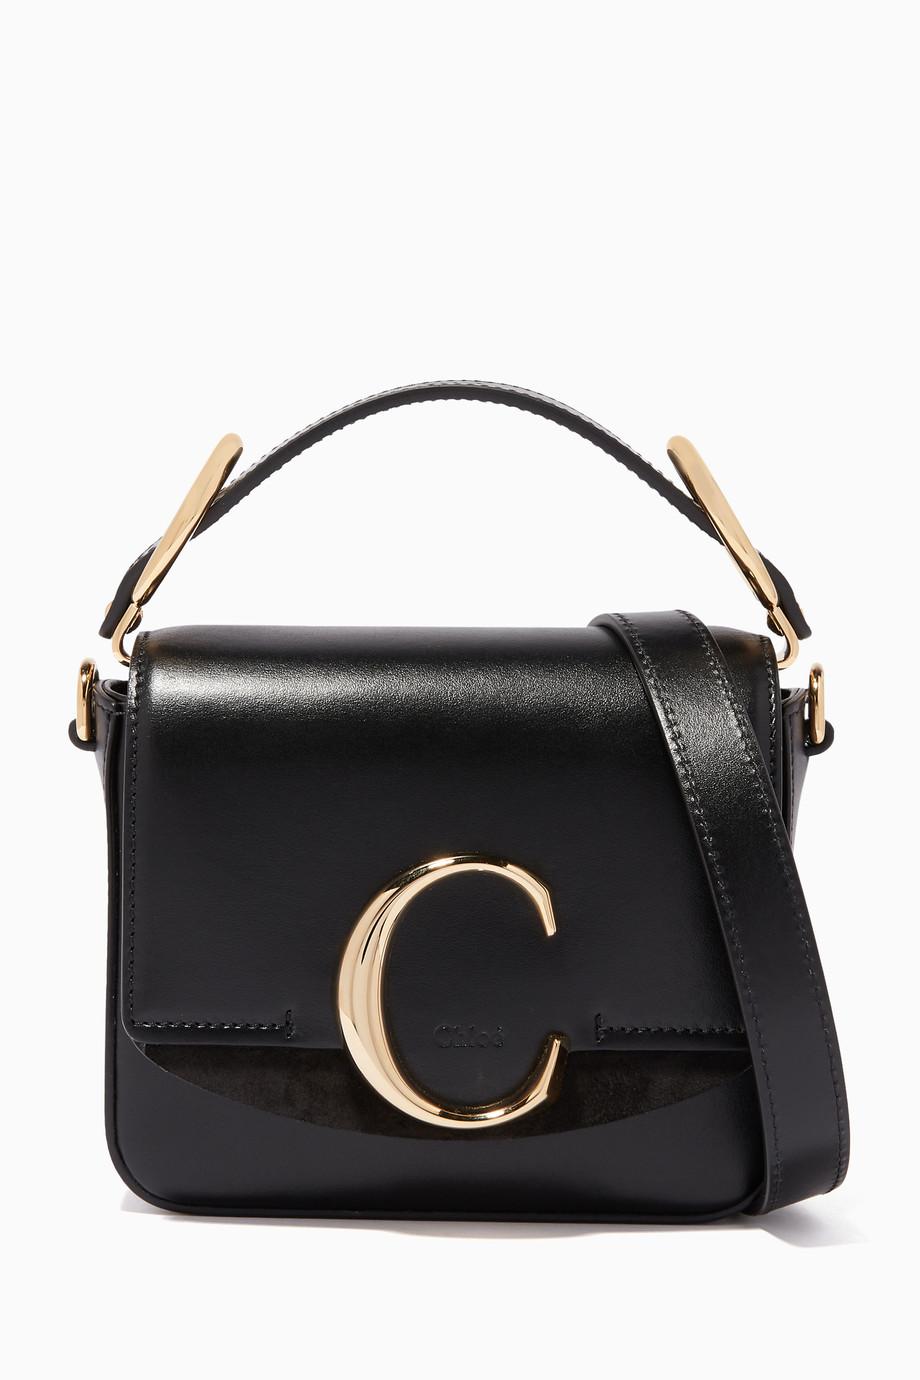 0c8f1150 Shop Chloé Black Mini Chloé C Shiny-Leather Shoulder Bag for Women ...